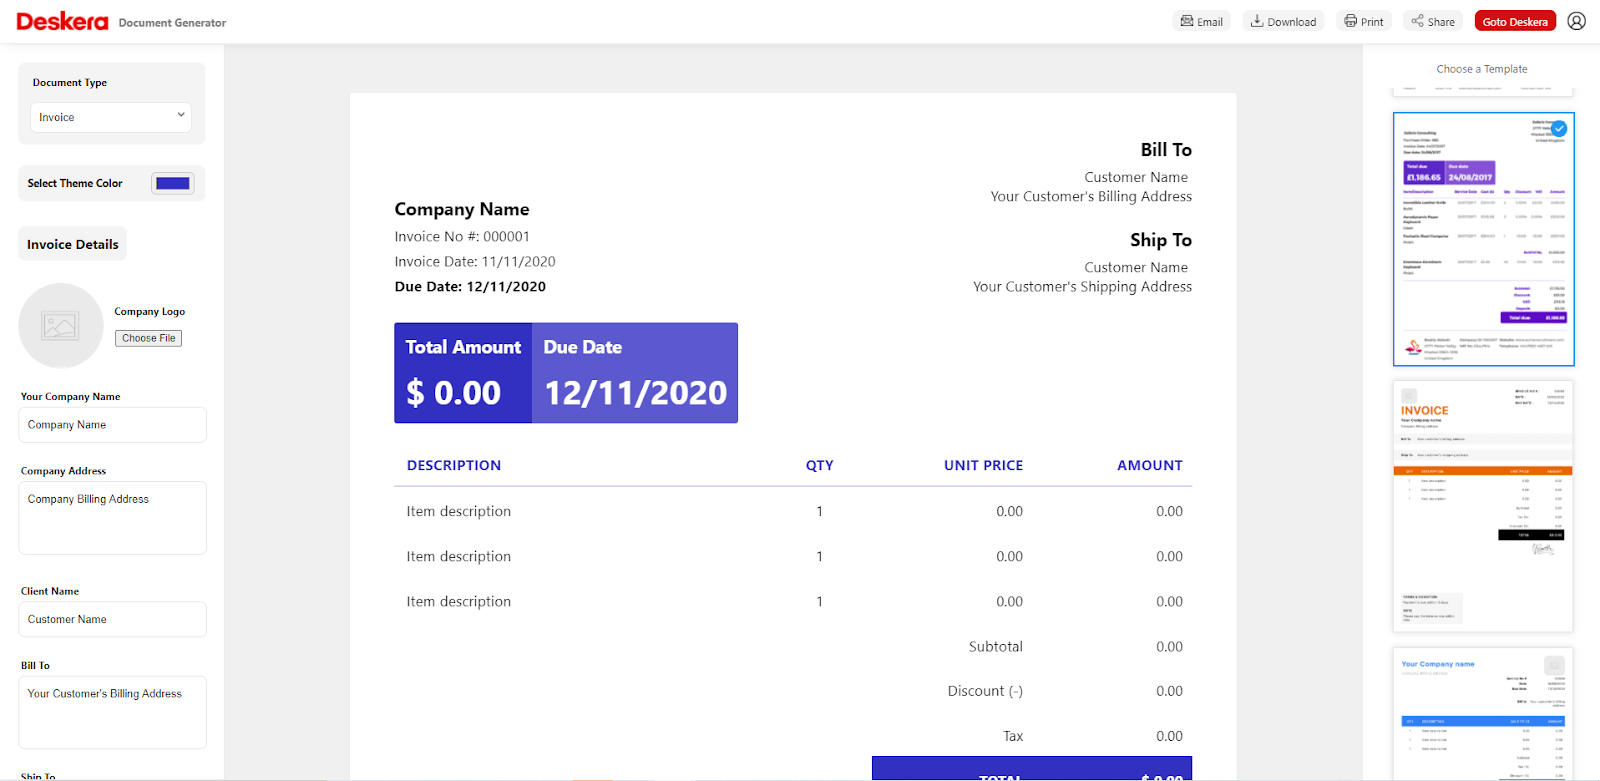 Custom Invoice Templates in Deskera - Accounting Software Advantages